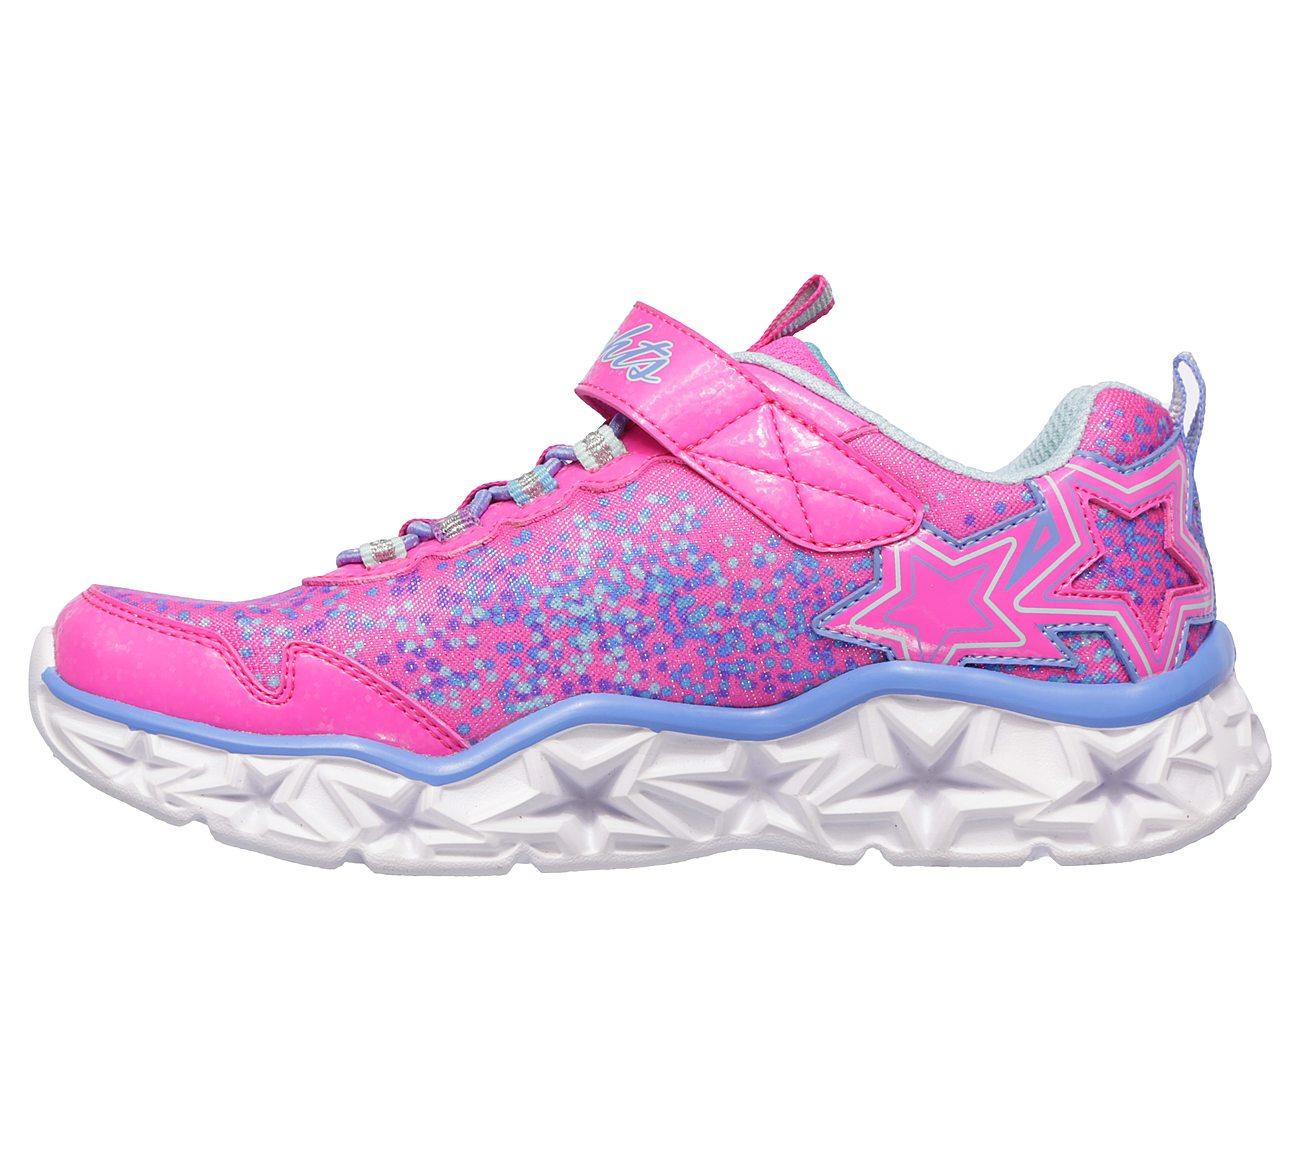 Galaxy Lights SKECHERS S-Lights Shoes